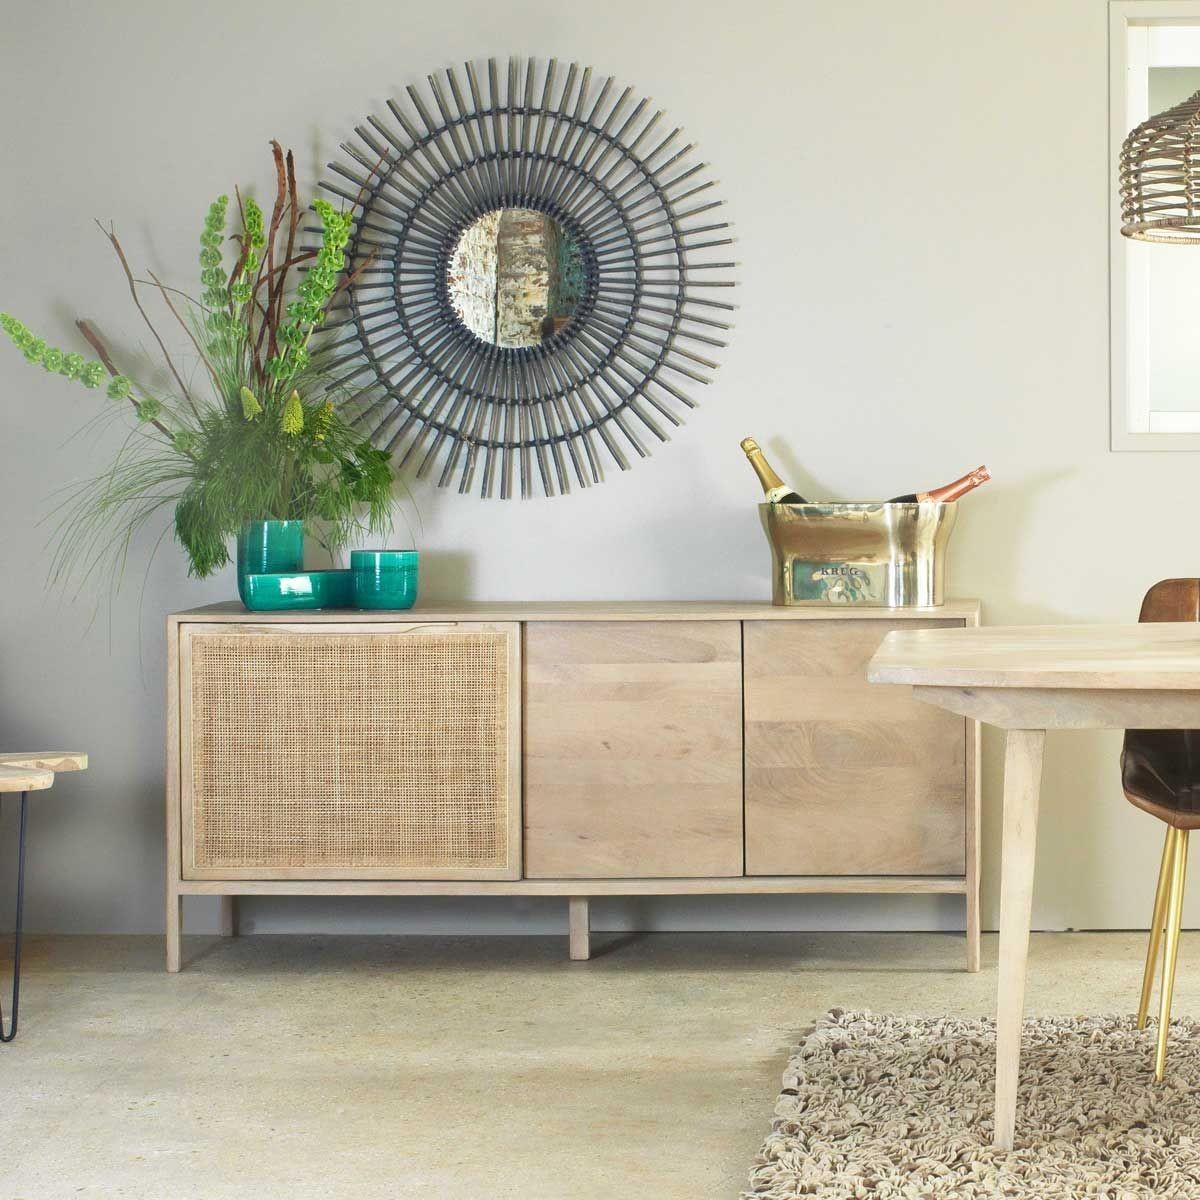 o trouver un buffet en cannage madame d core. Black Bedroom Furniture Sets. Home Design Ideas